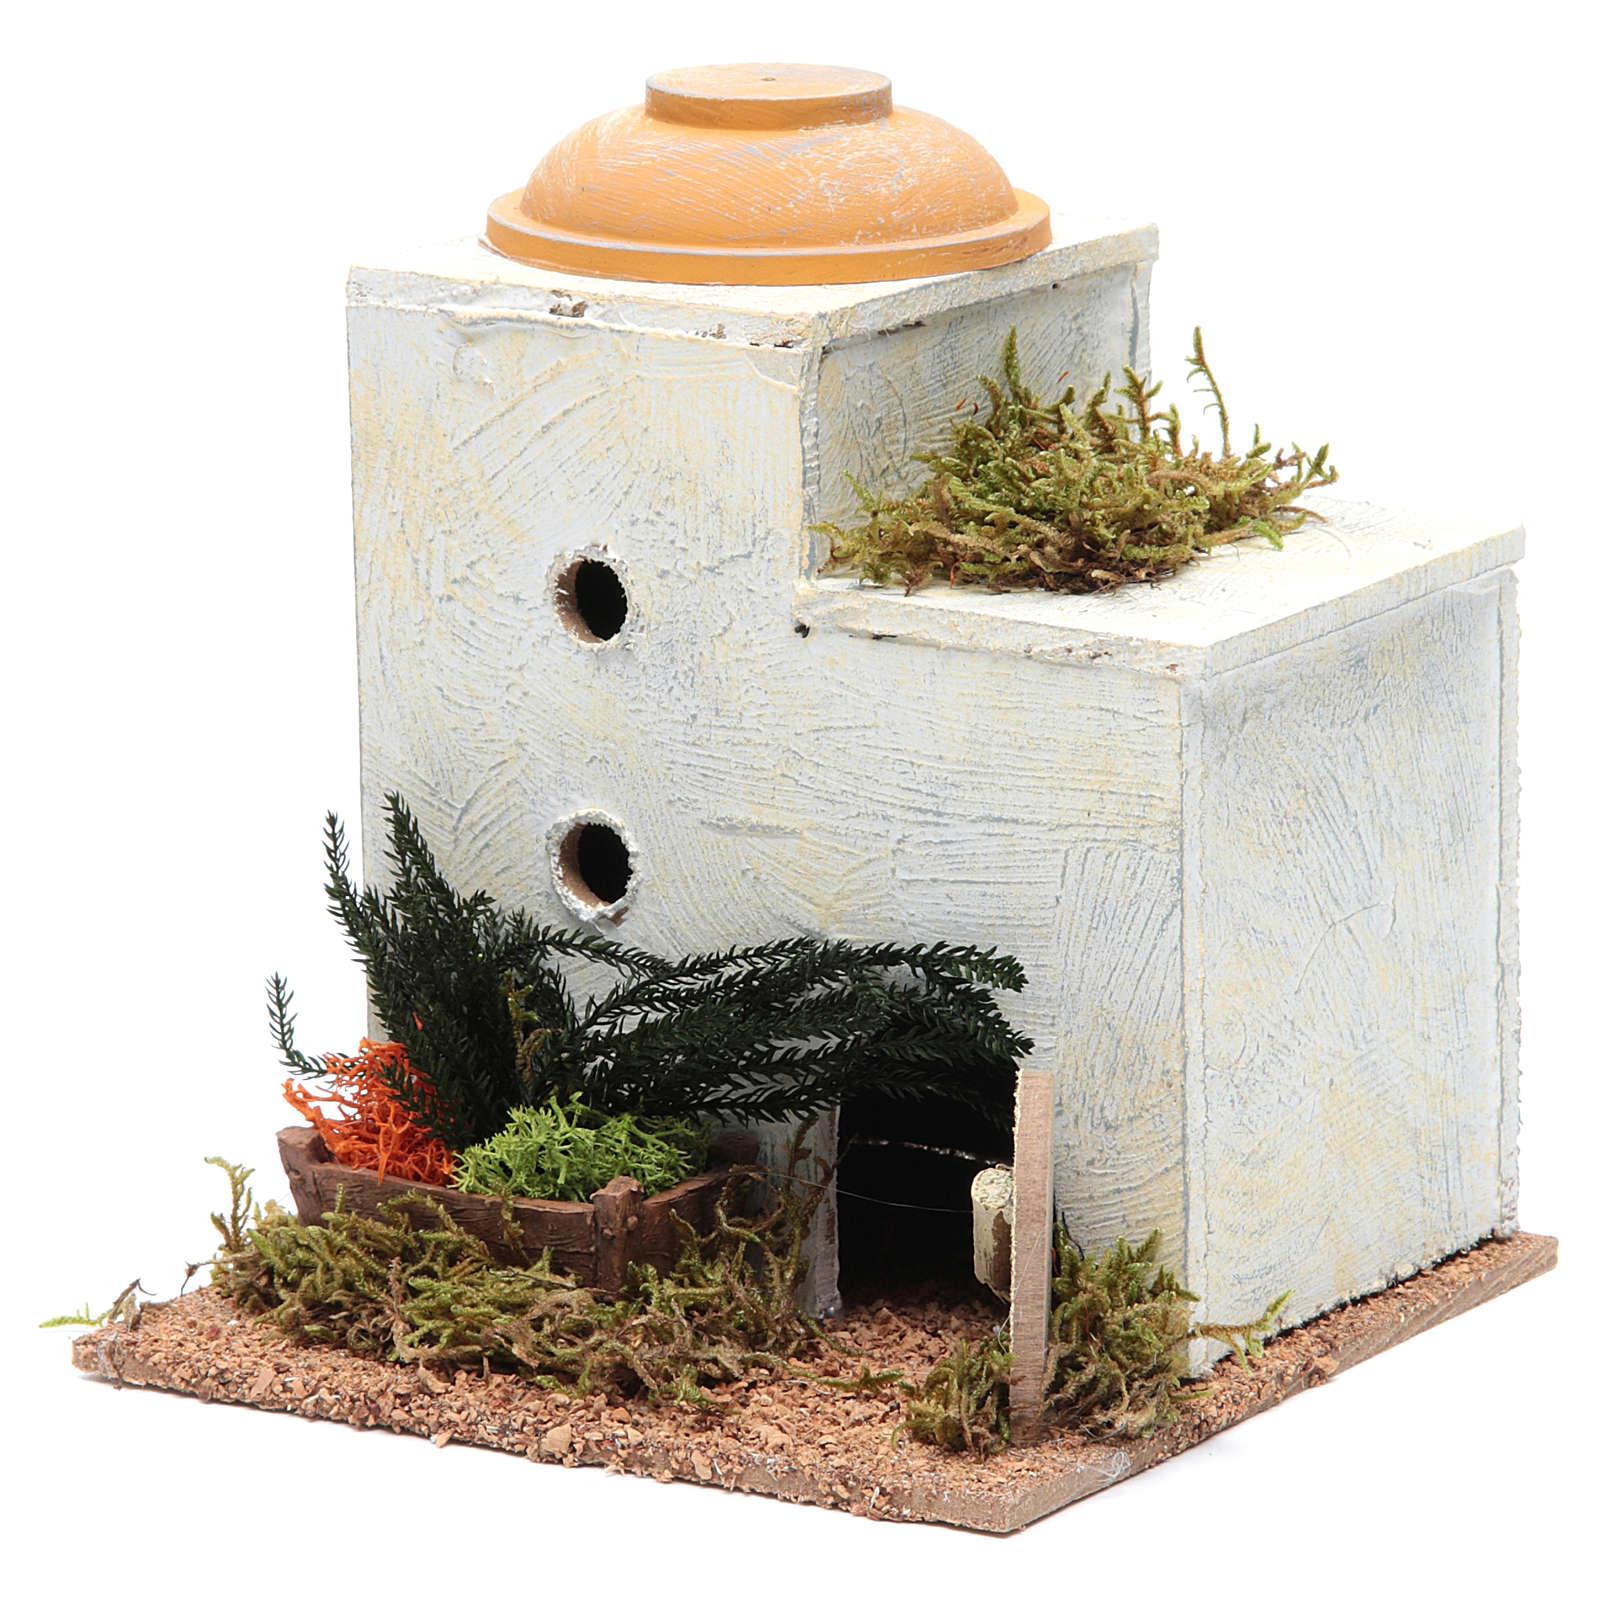 Casa araba legno per presepe 18x15x15 cm 4